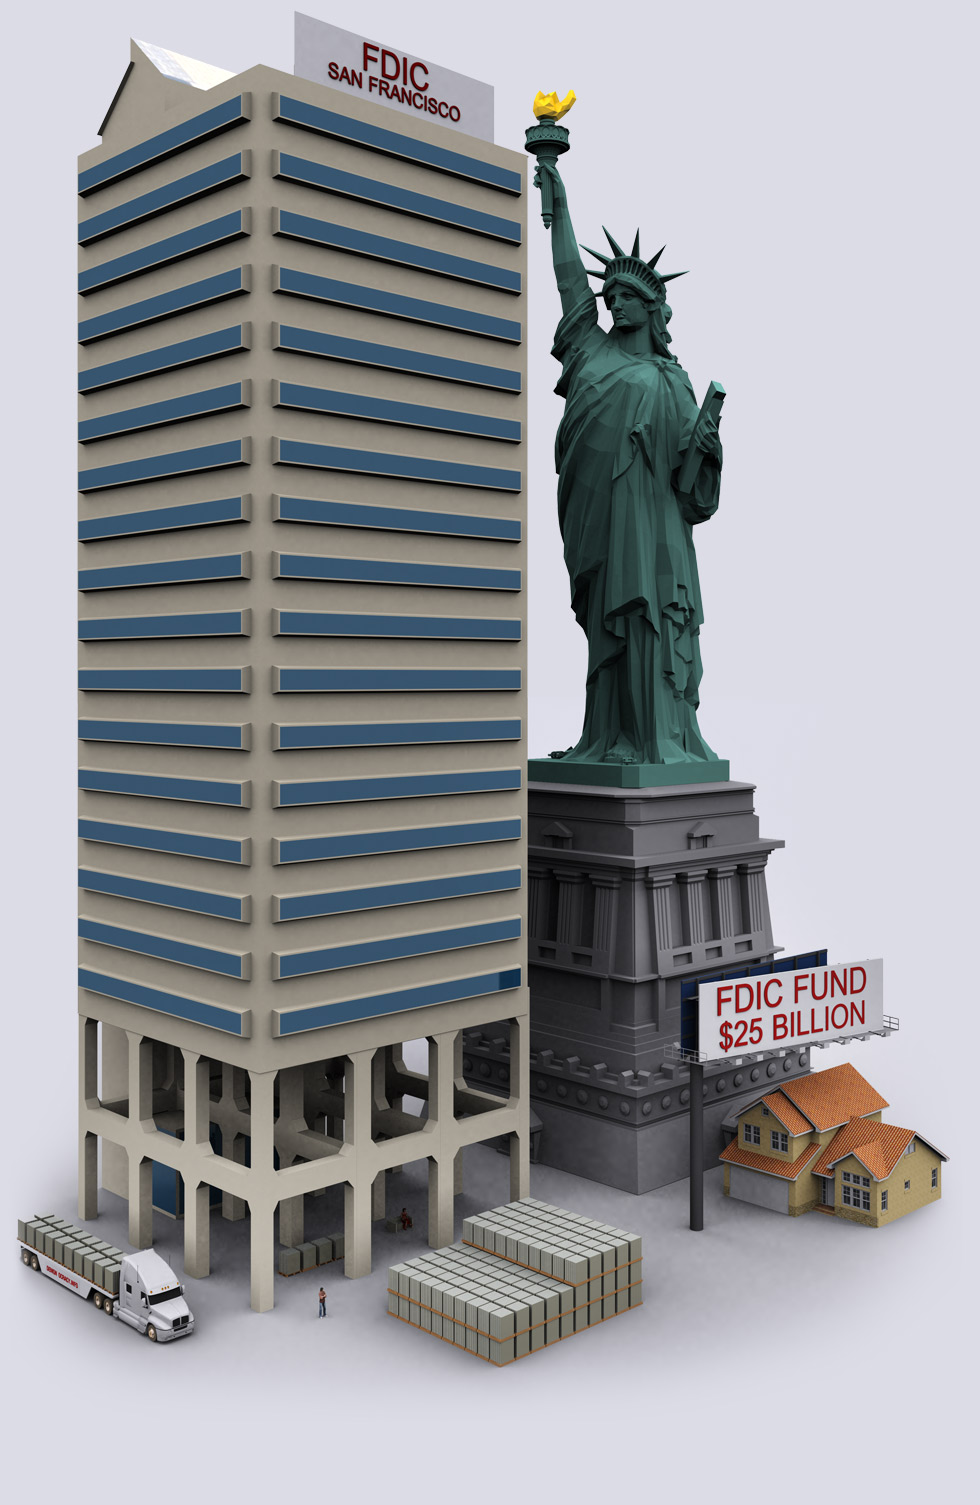 FDIC Insurance Deposit Fund - $25 Billion